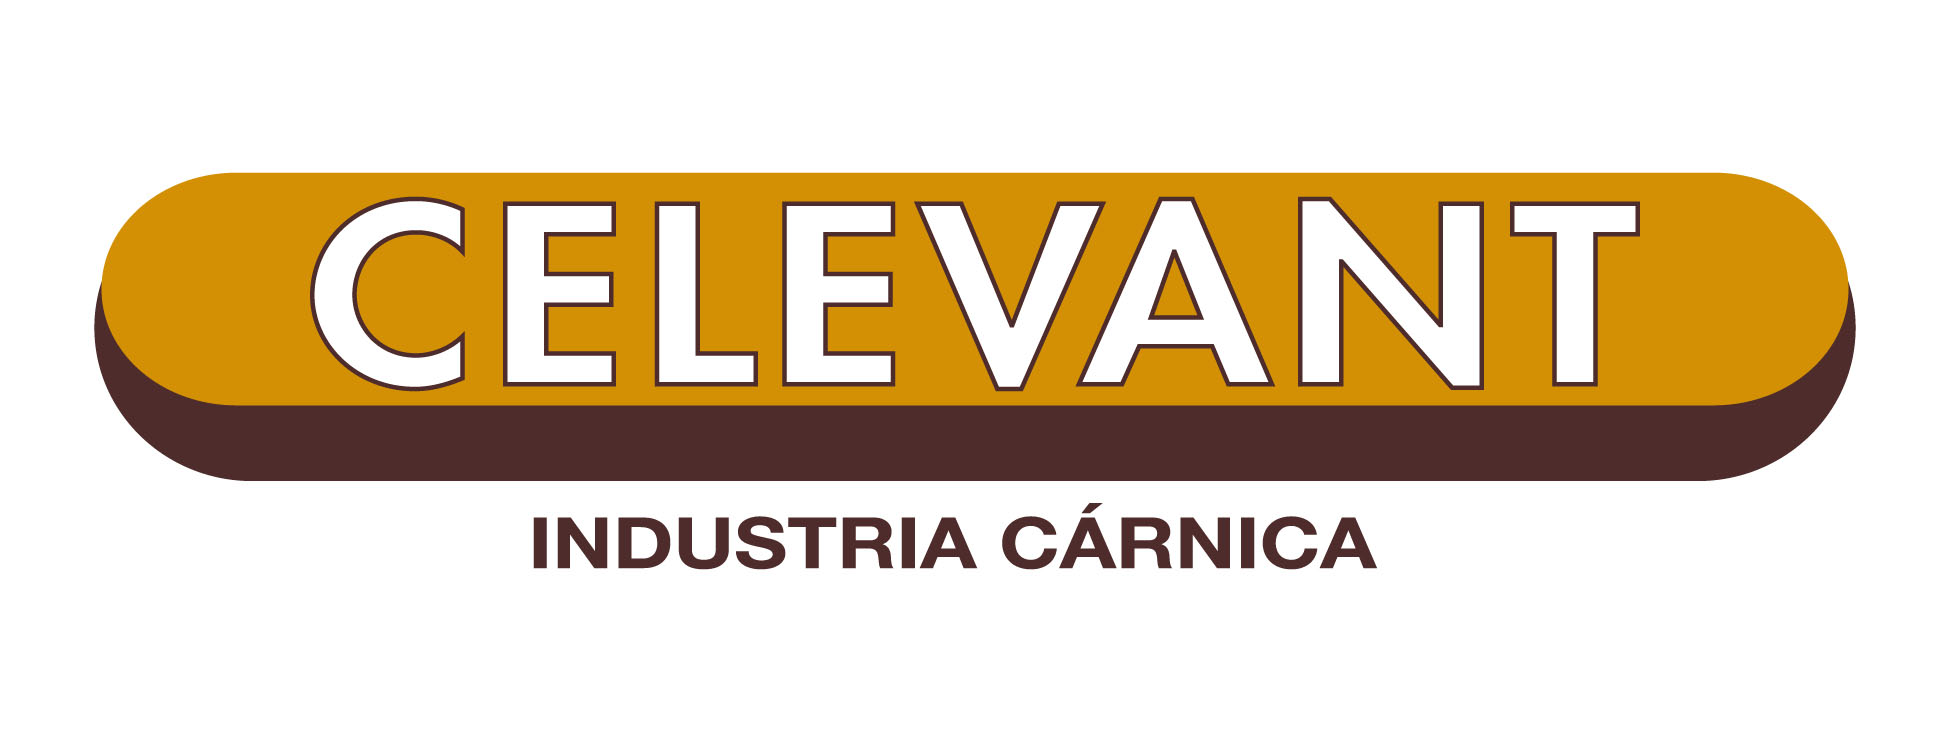 Celevant logo - CELEVANT